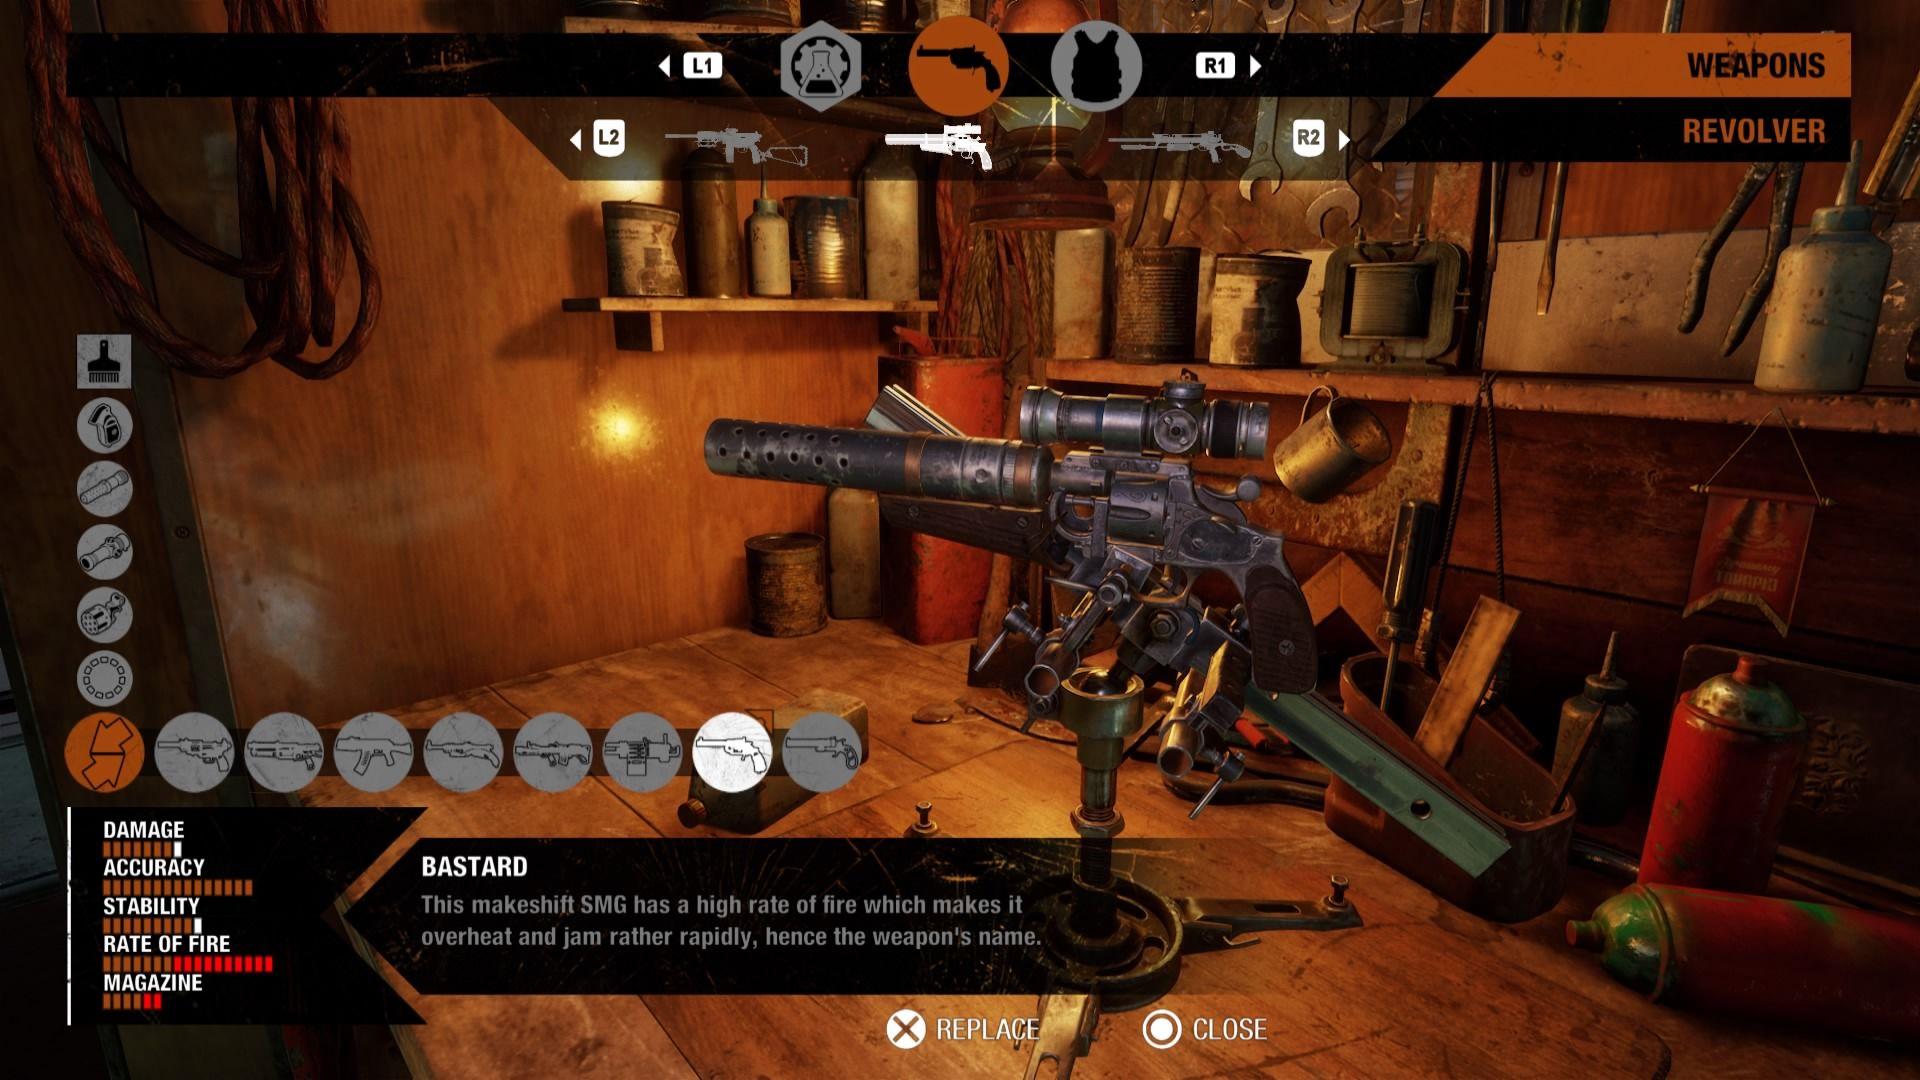 metro-exodus-weapons-list-revolver-customization-guide